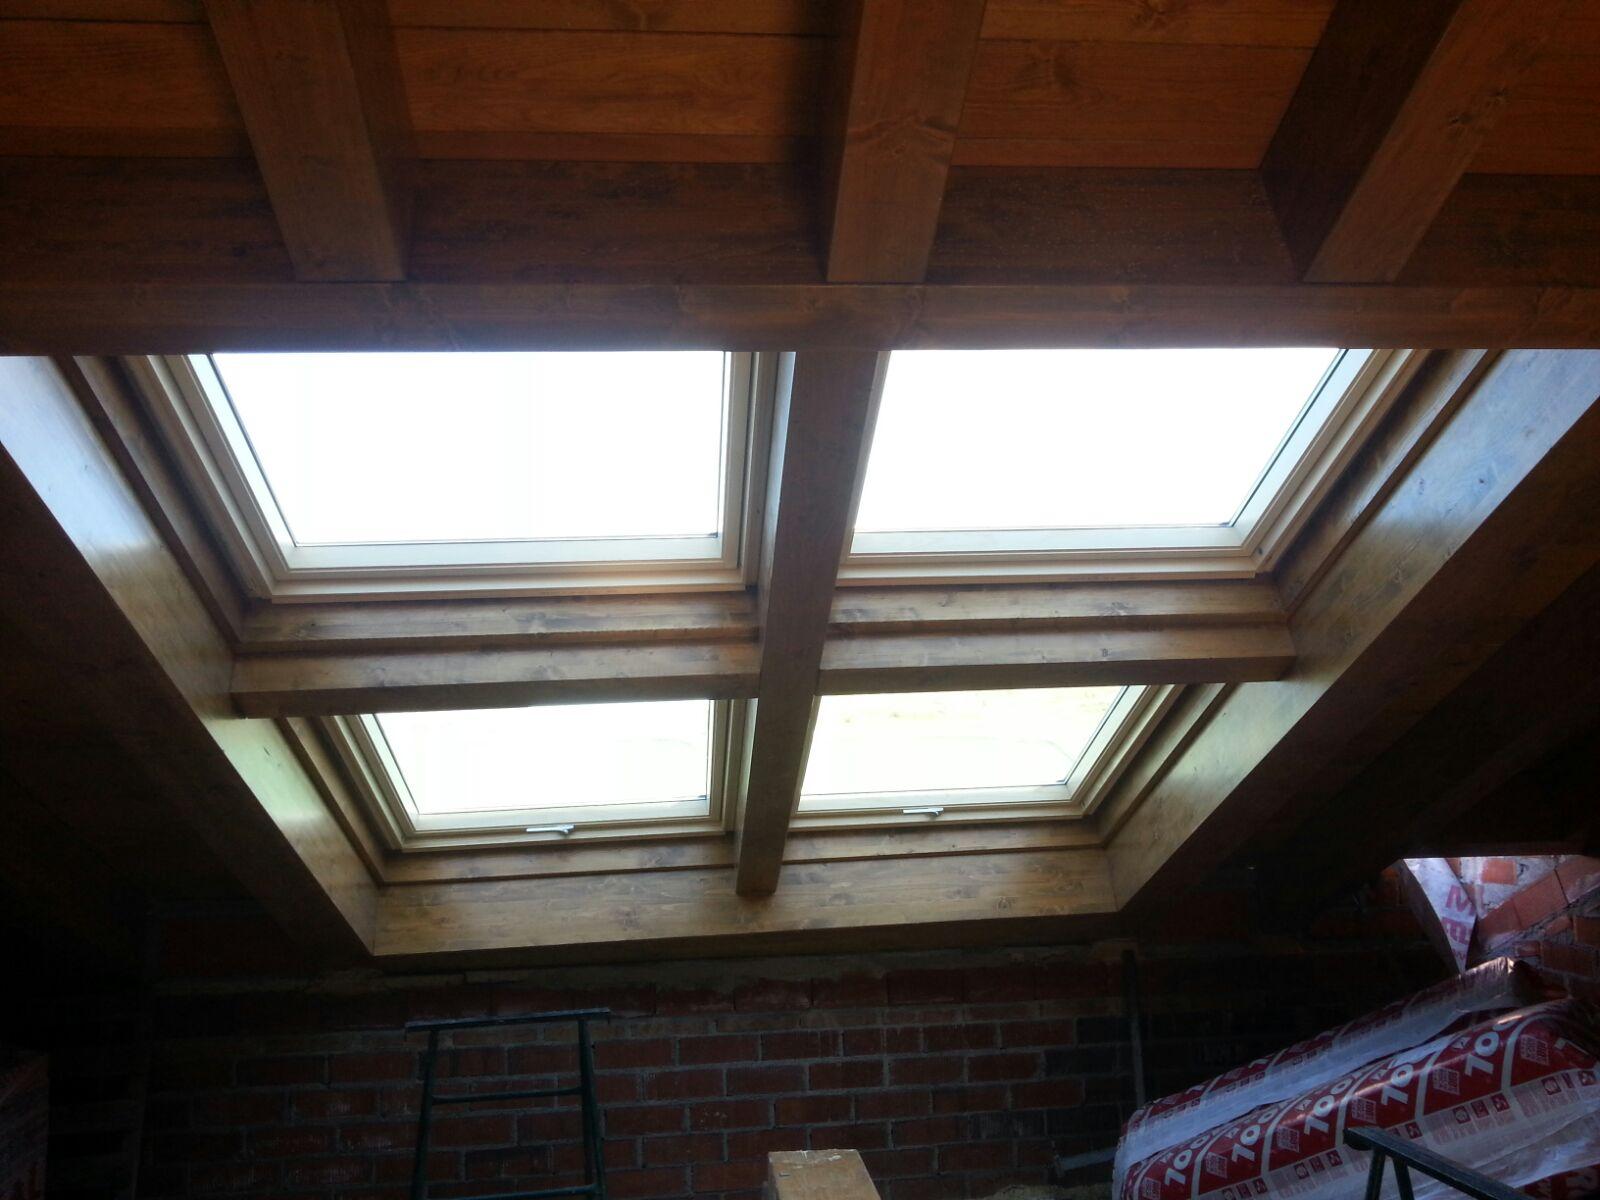 Fusteria Corcoy | Construint un teulat de fusta - photo#8